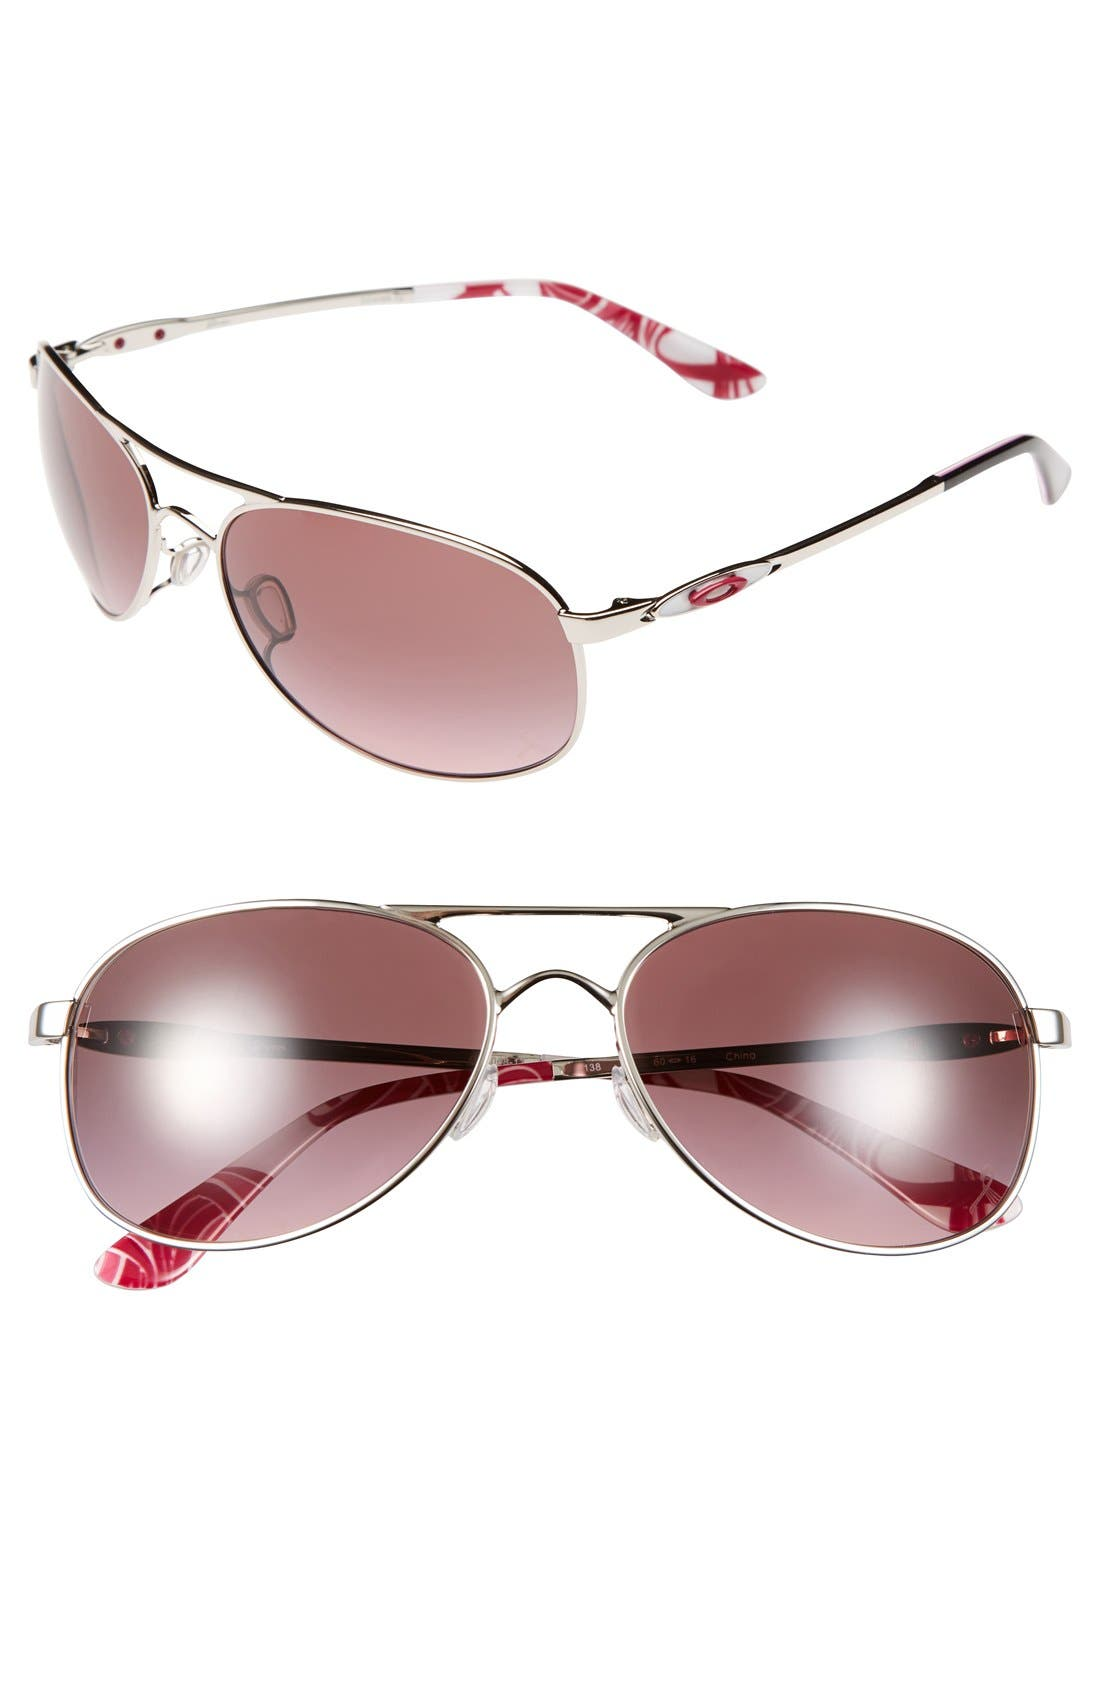 Main Image - Oakley 'Given' 60mm Sunglasses